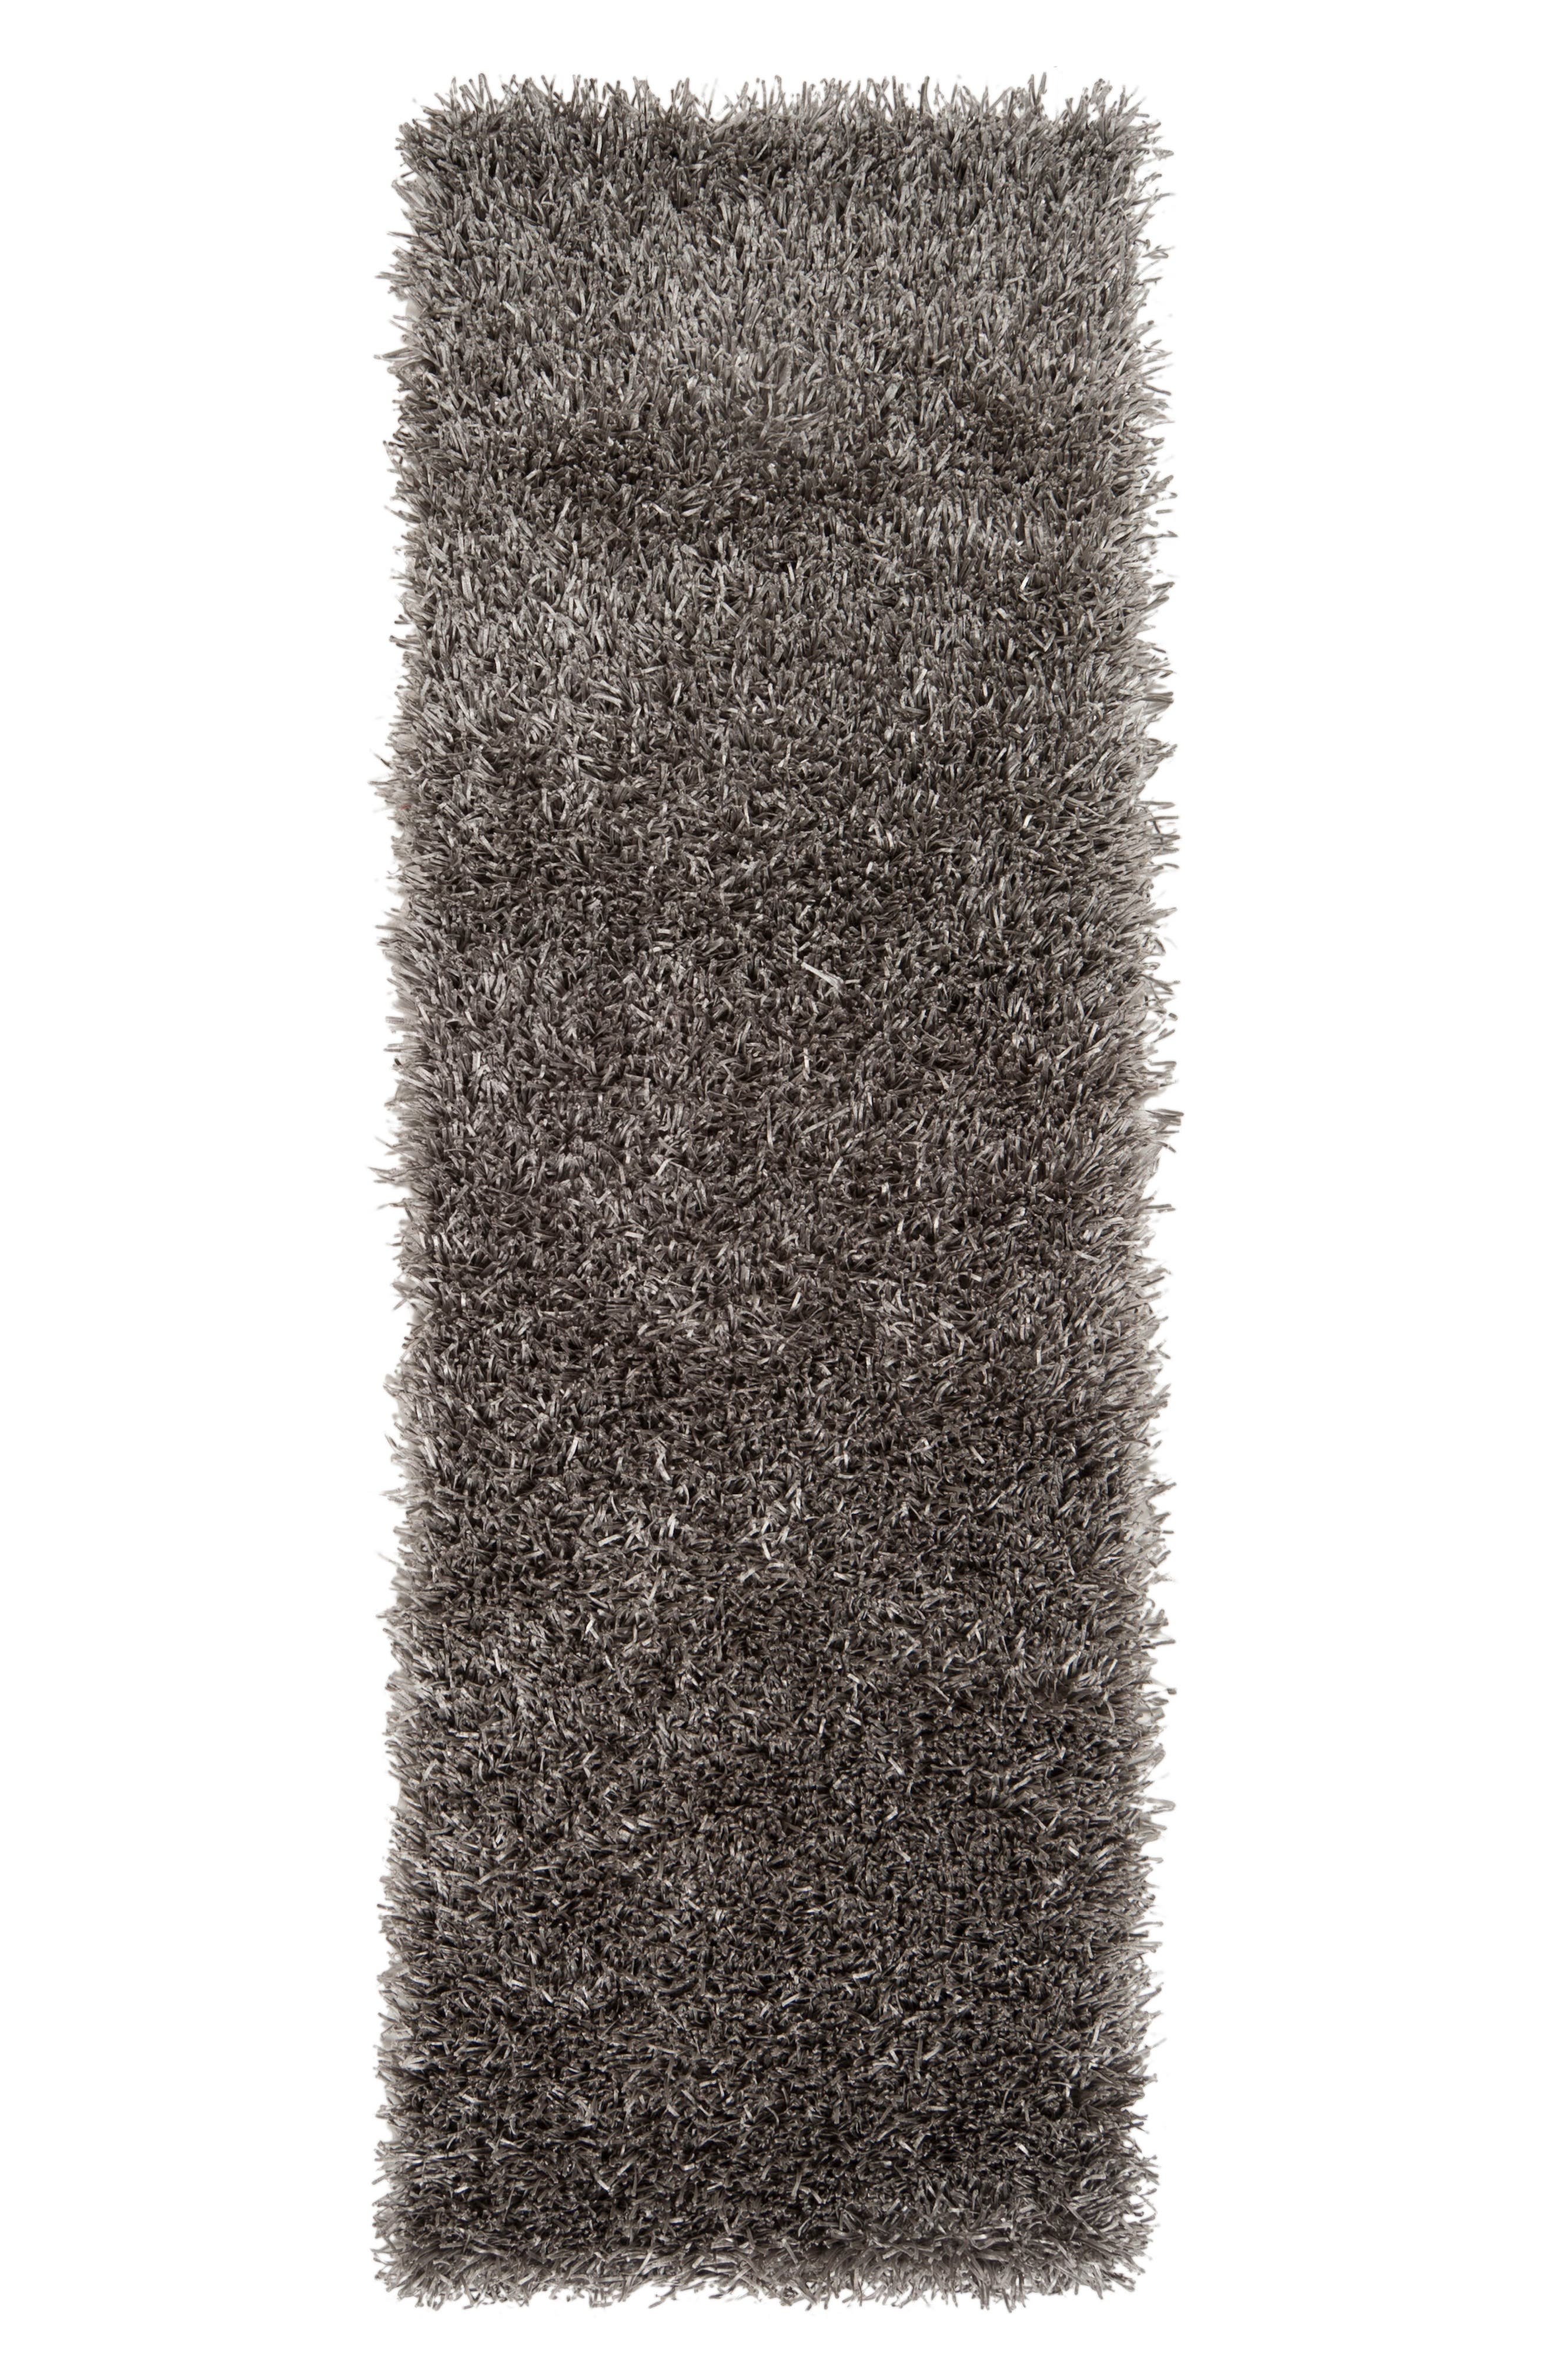 Shimmer Area Rug,                             Main thumbnail 1, color,                             020